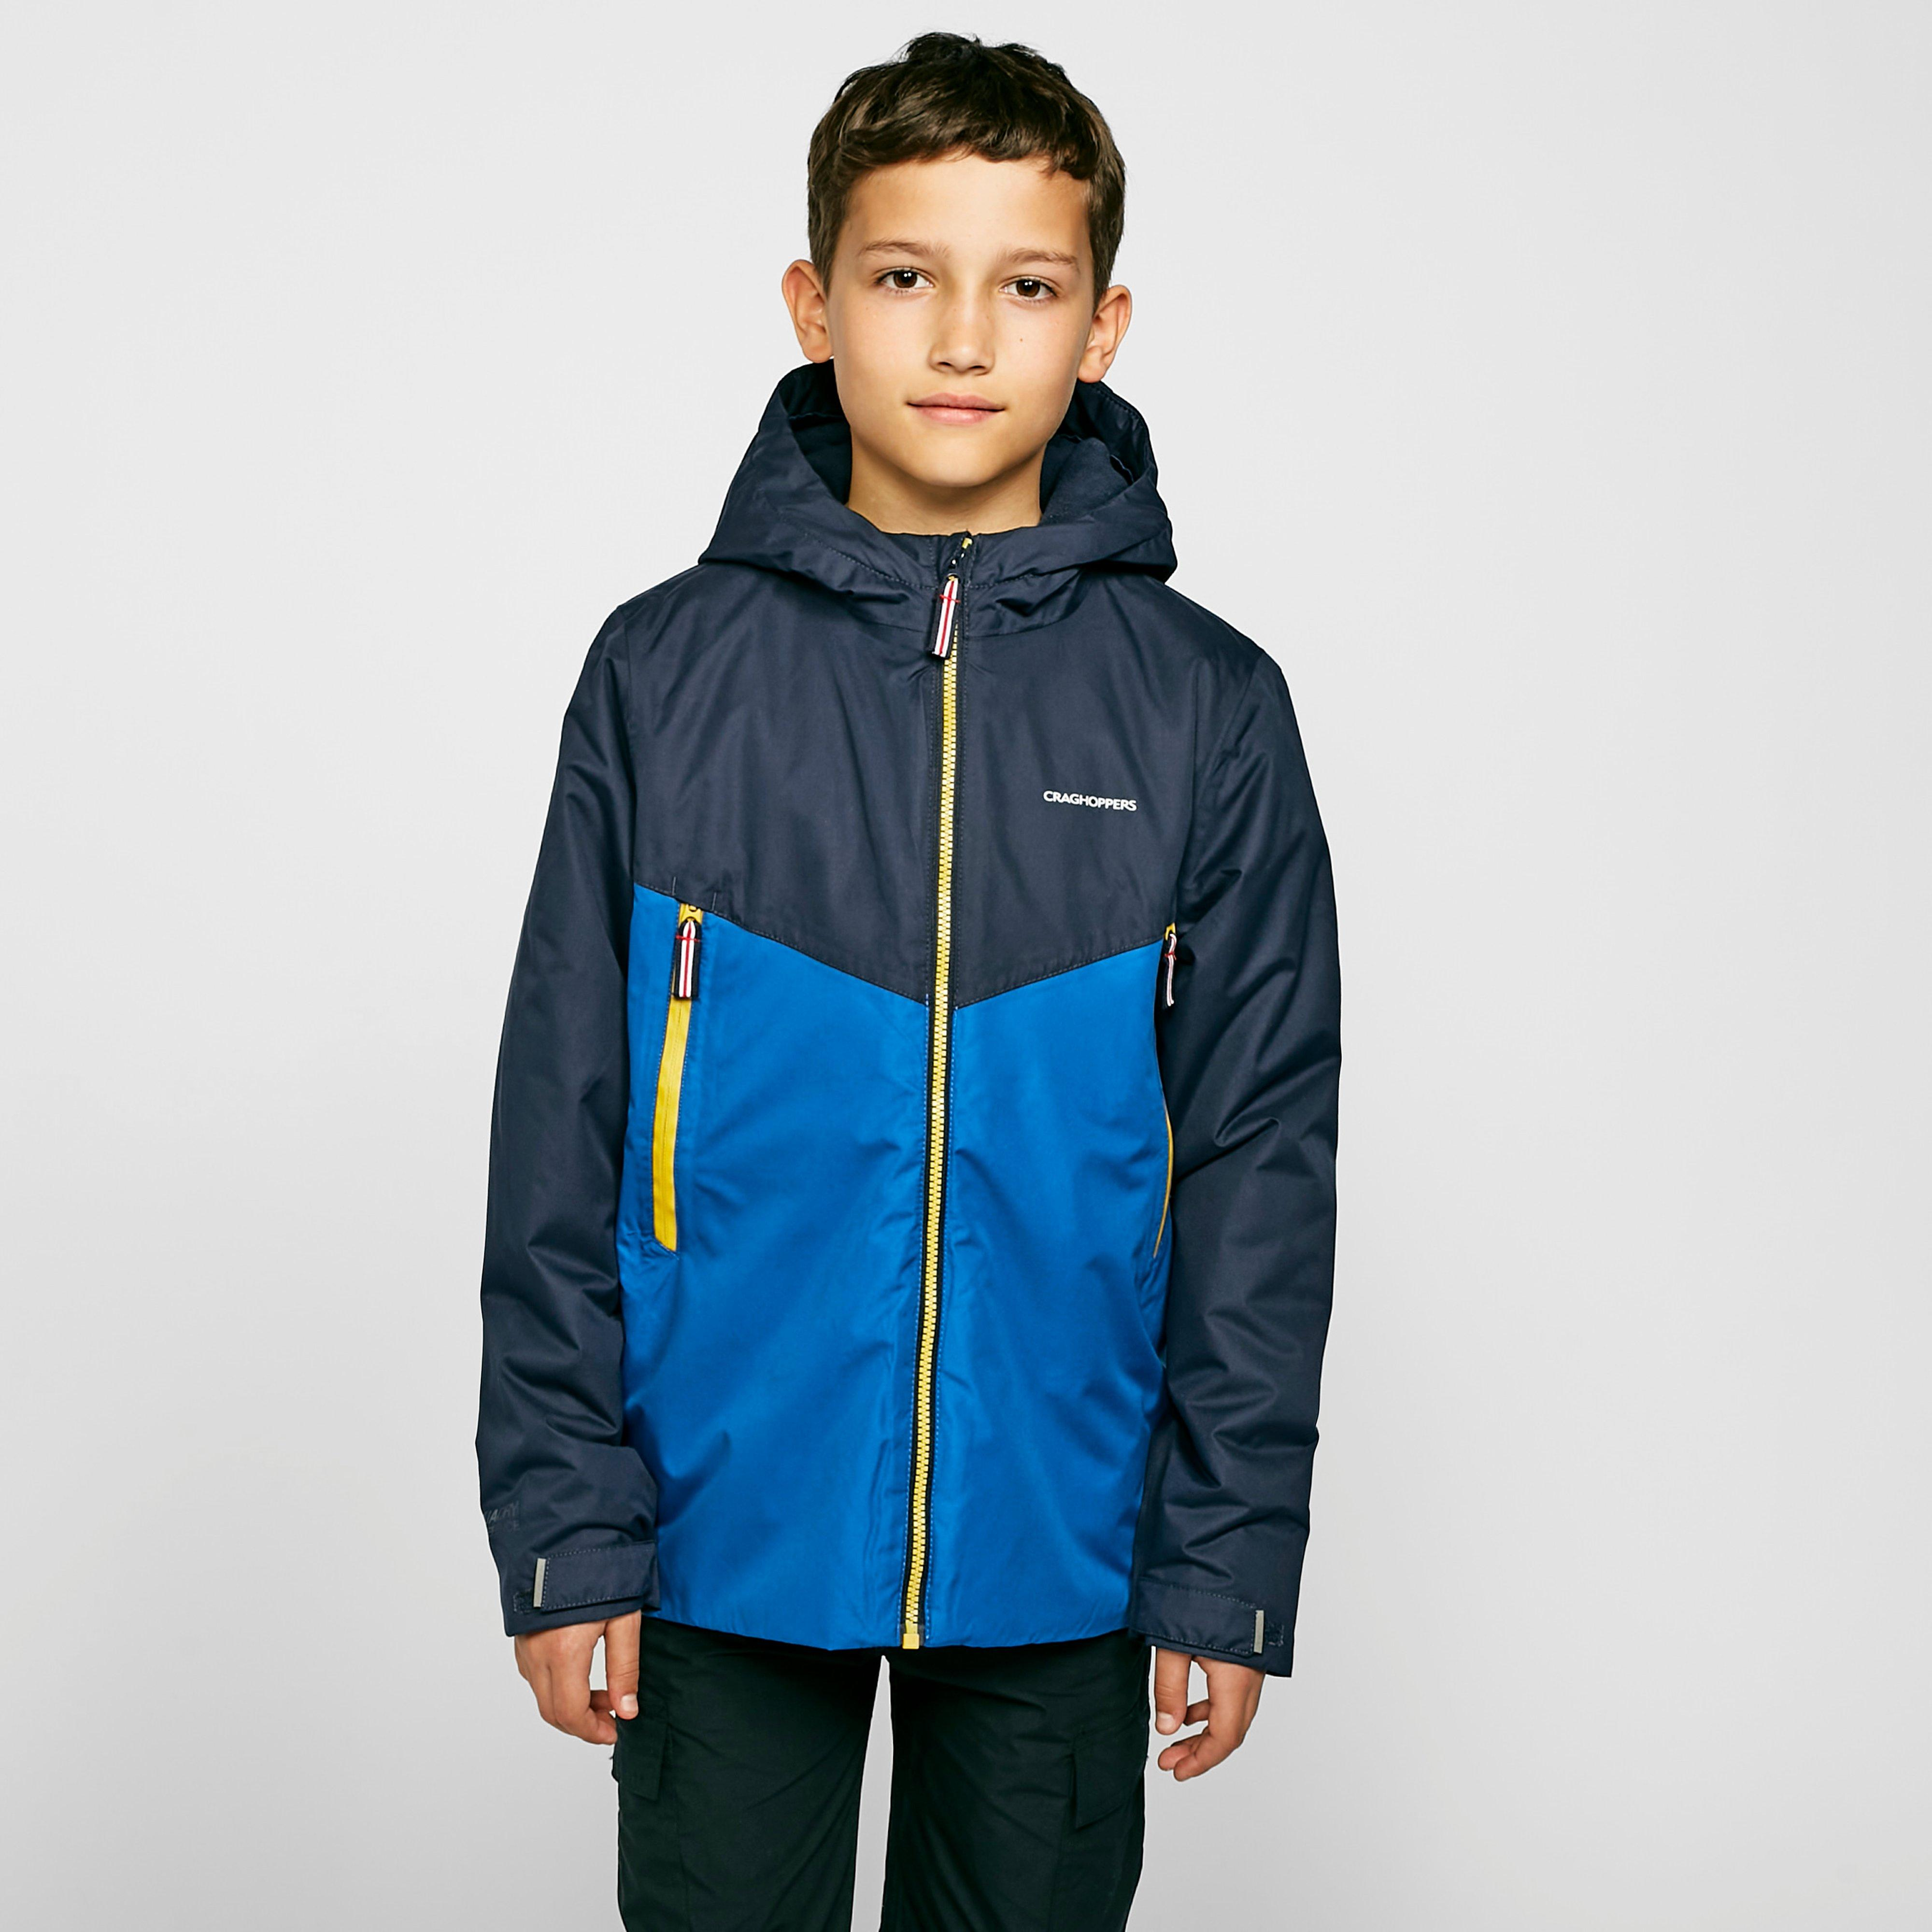 Craghoppers Kids' Haider Jacket - Blue/Nvy, Blue/Navy